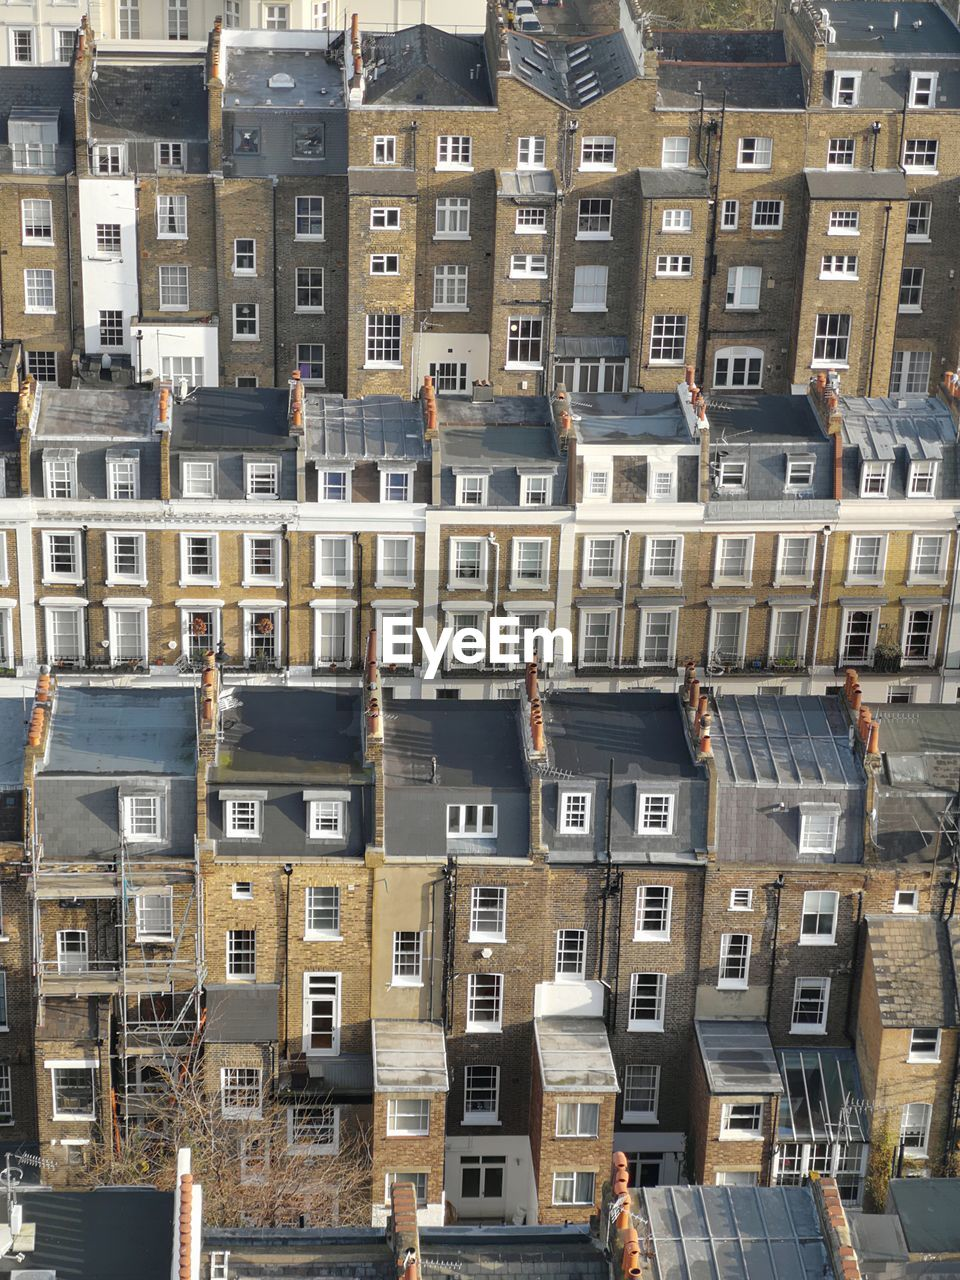 London townhouses